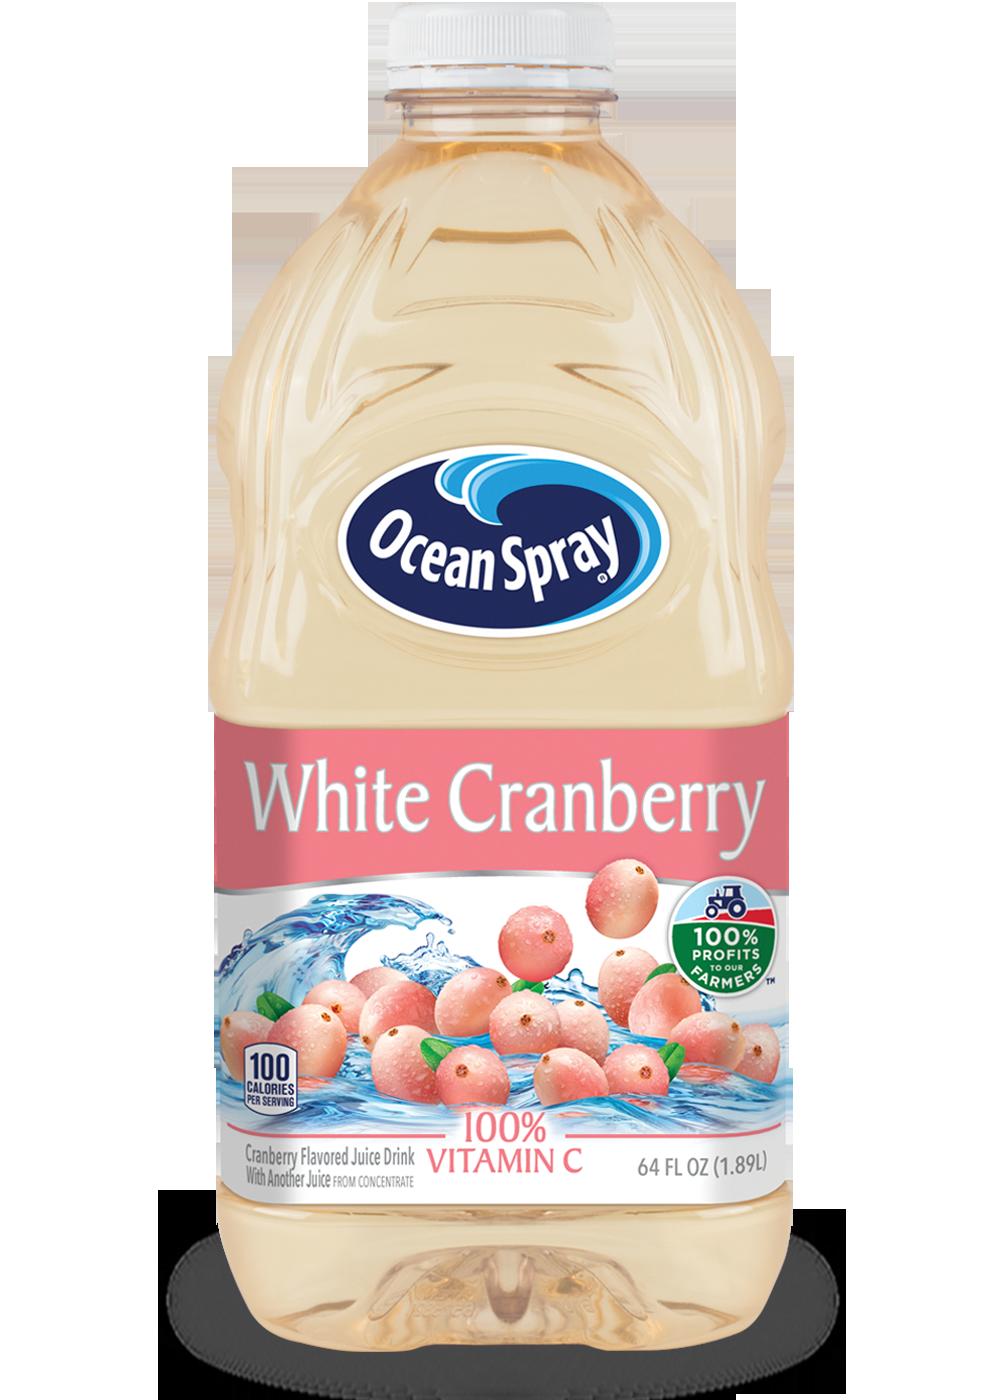 White Cranberry Juice Drink Ocean Spray